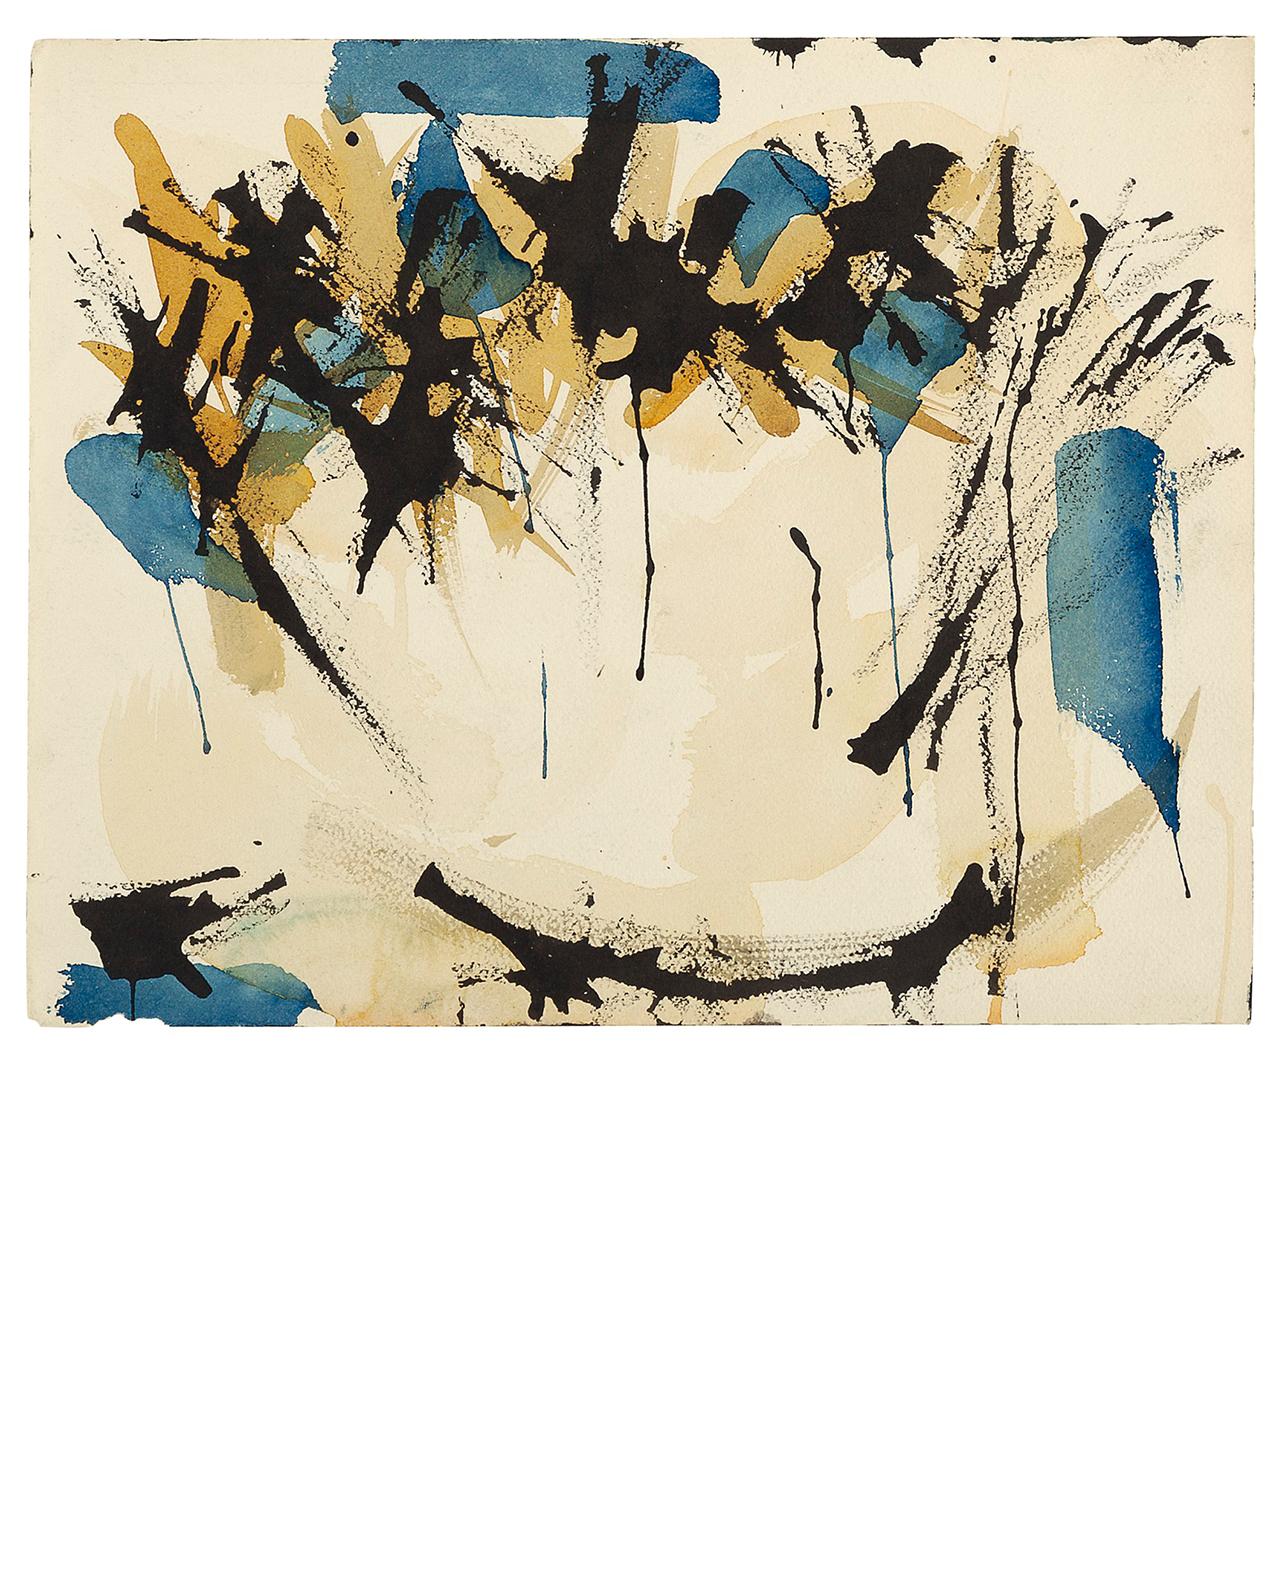 Untitled (Blue, Black and Ochre), circa 1950